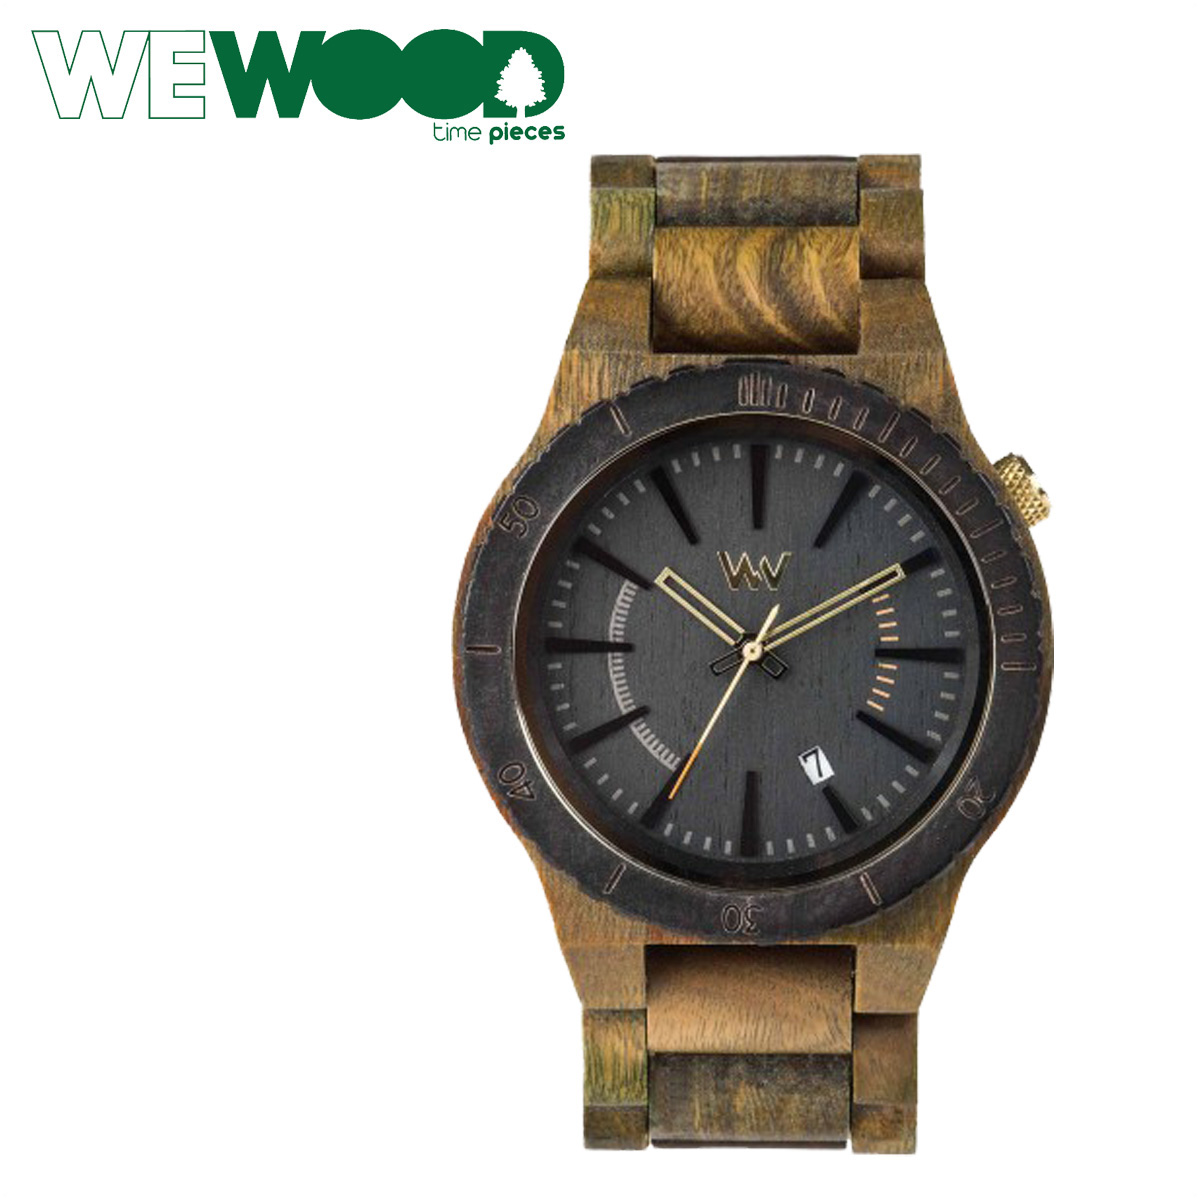 c774884dd2 ウィーウッド 腕時計 WEWOOD メンズ レディース ASSUNT ARMY WASNAR グリーン